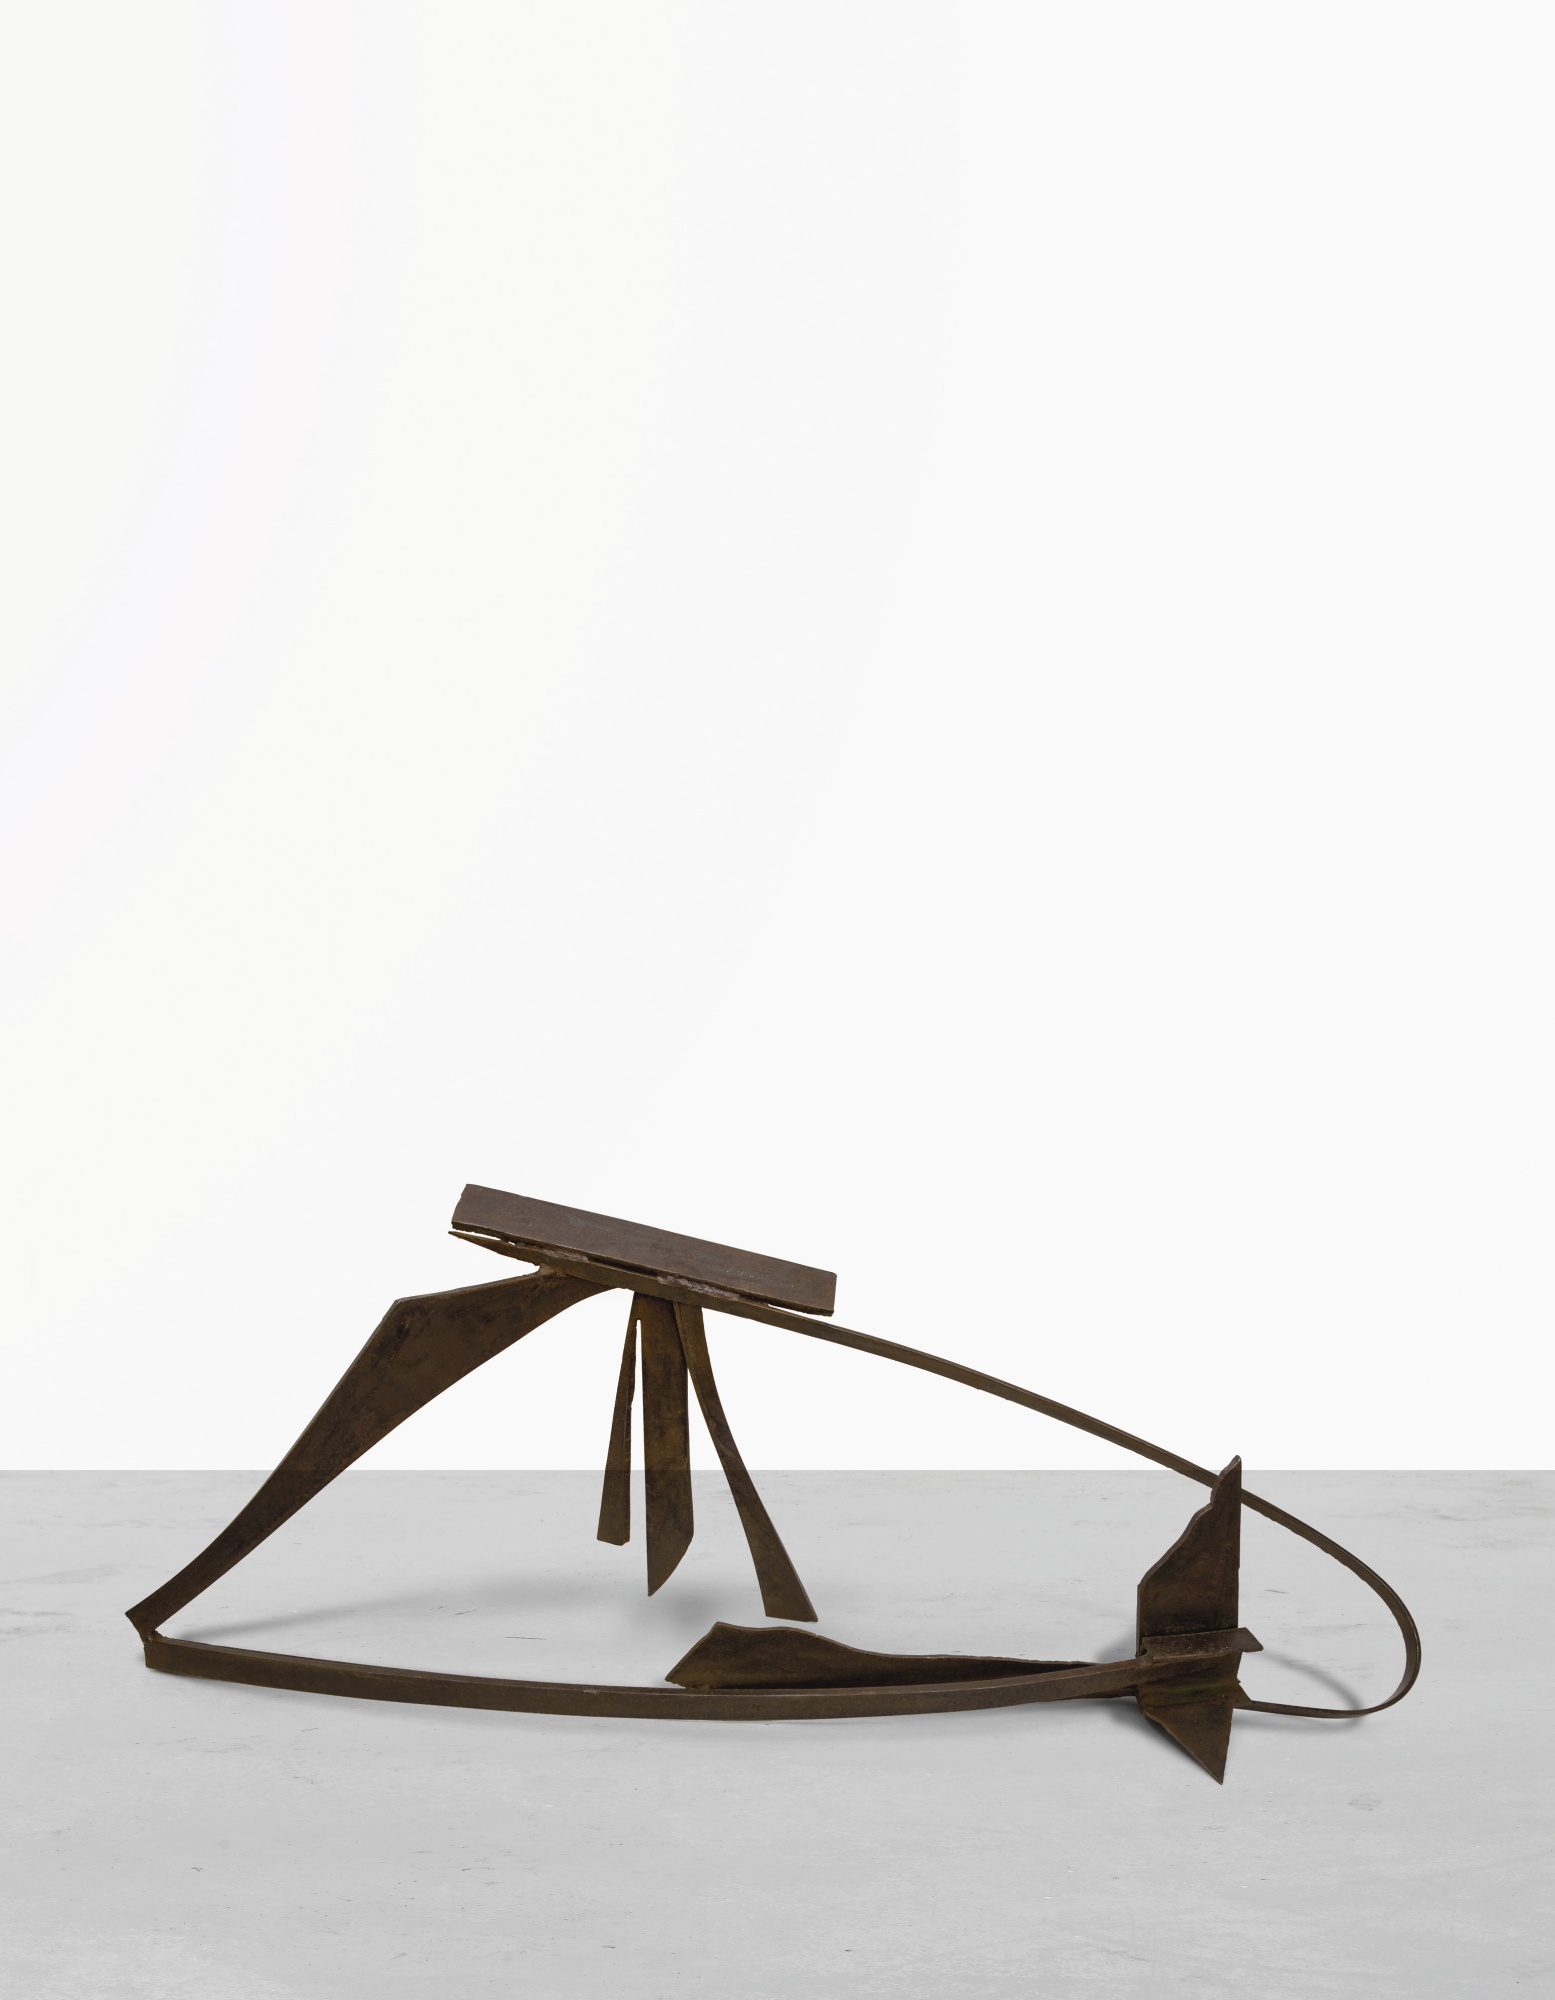 Anthony Caro-Table Piece CCCXCII-1977